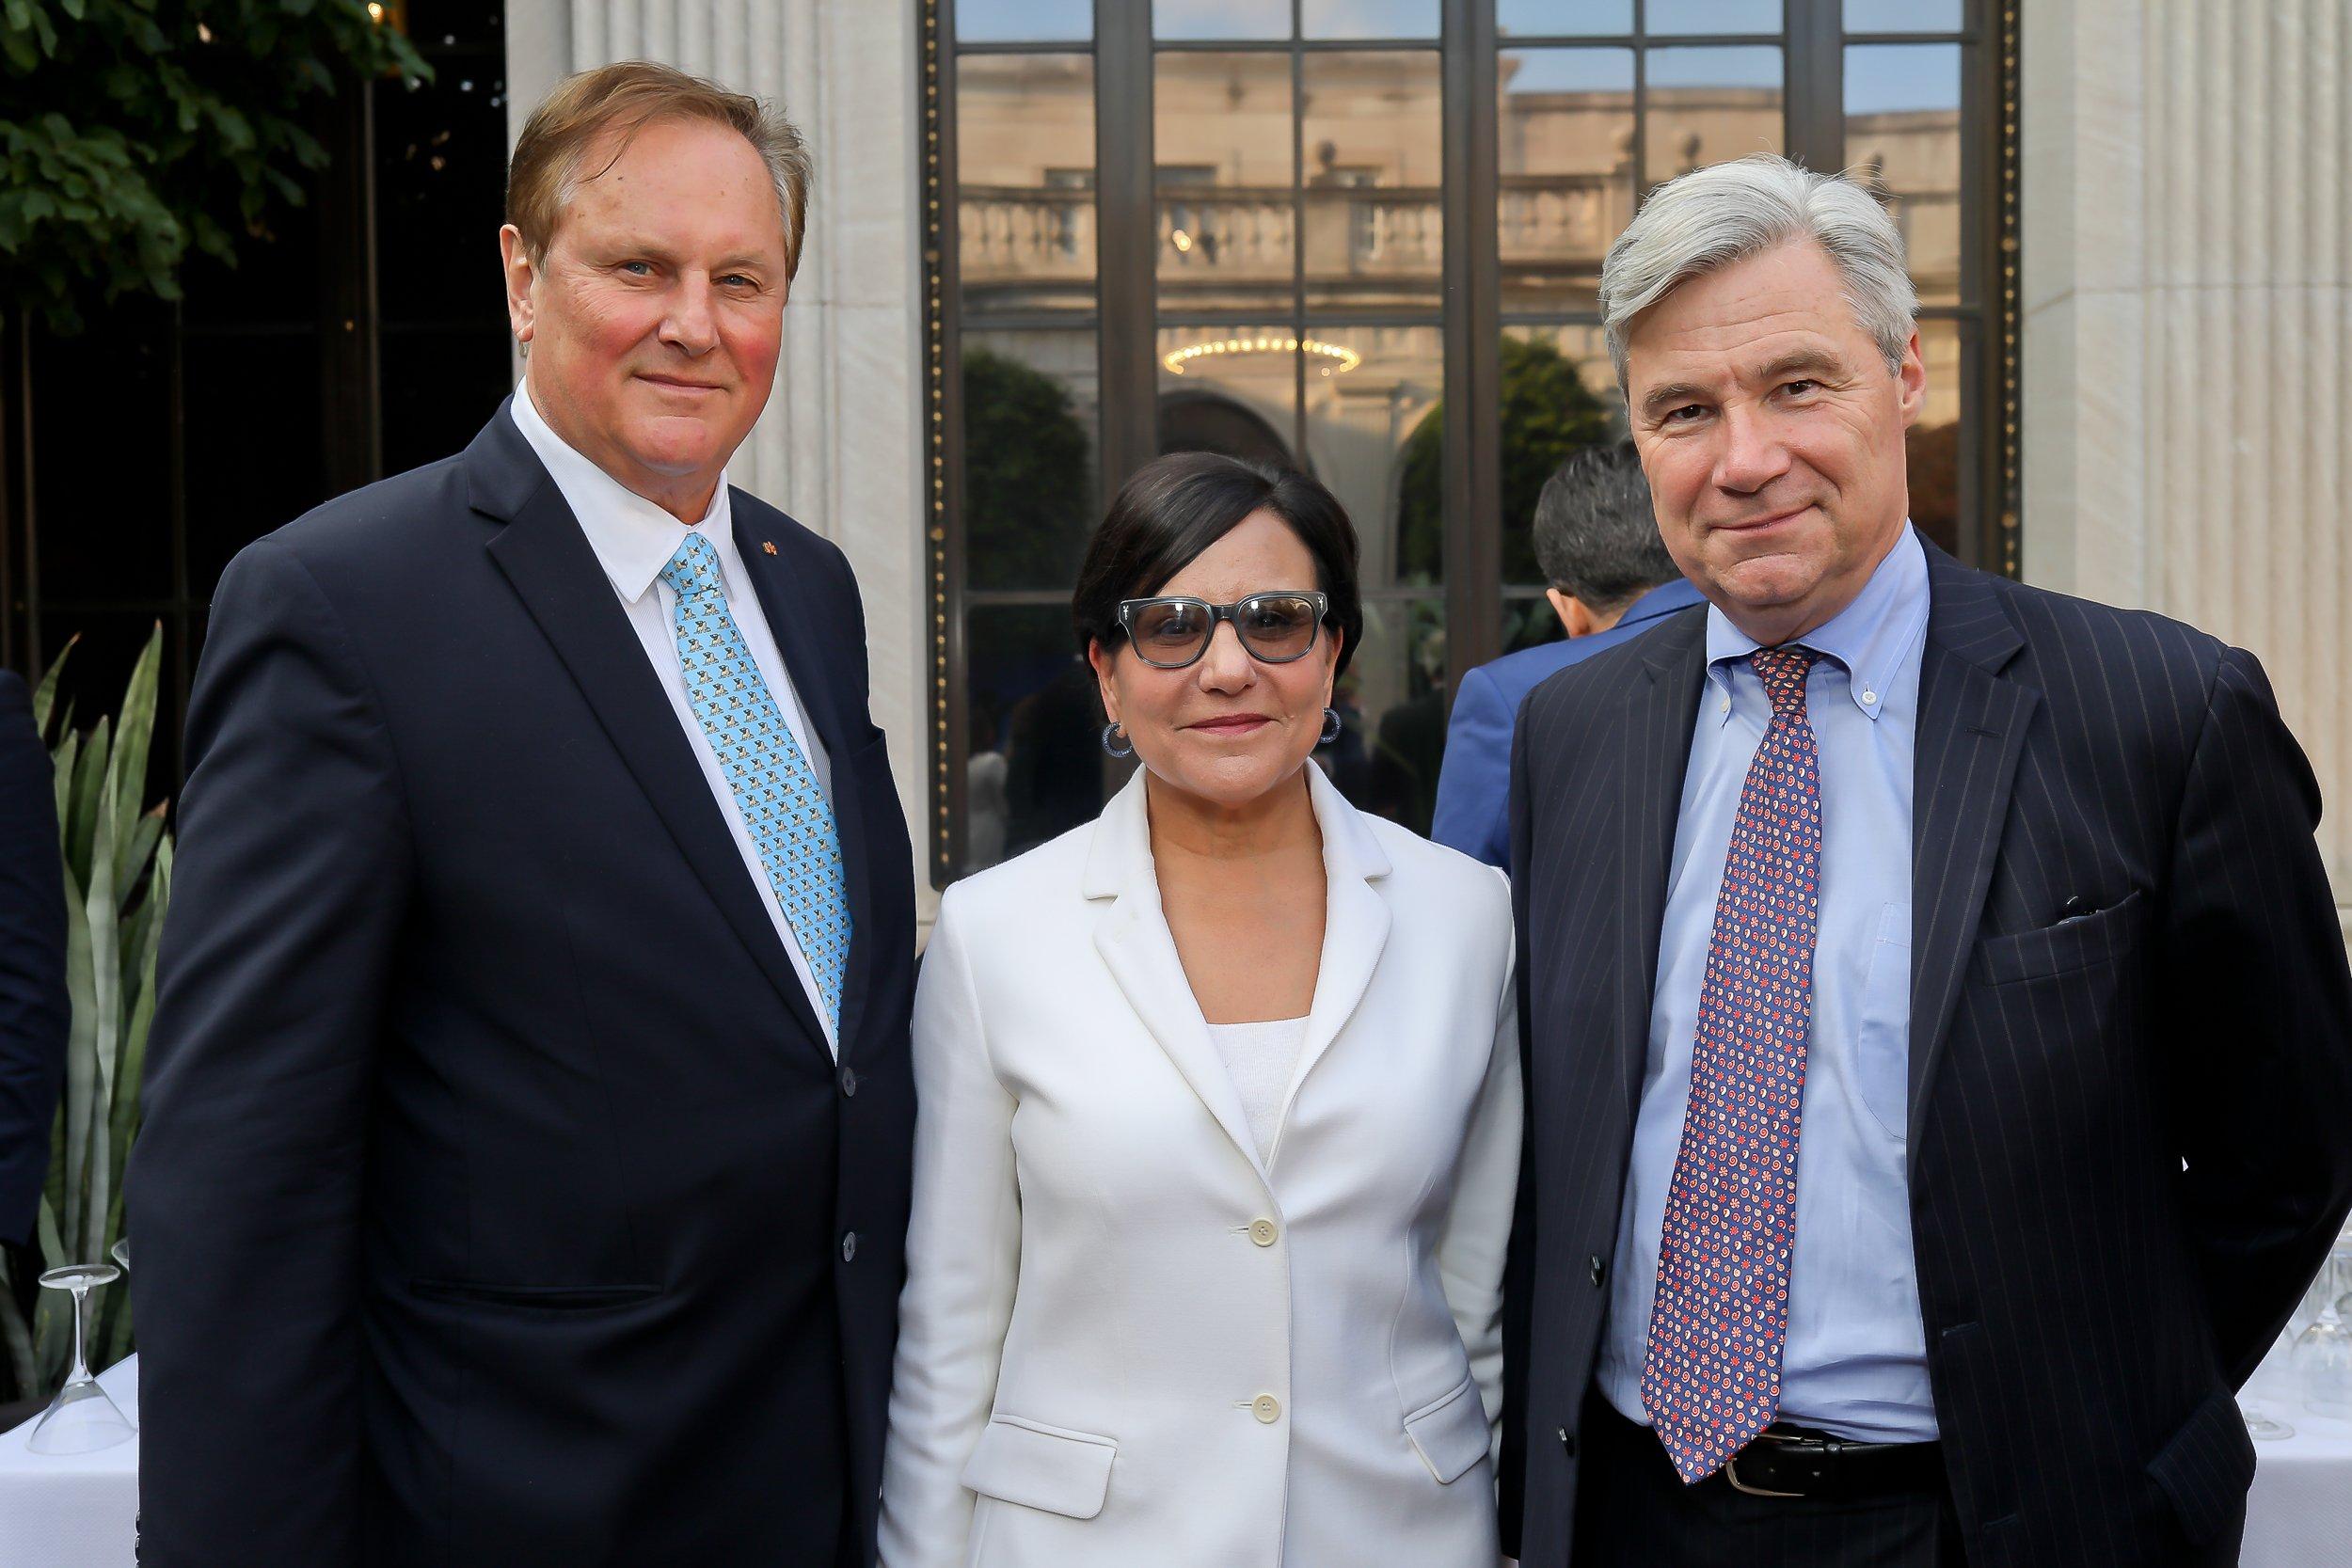 McLarty Associates Senior Advisor William Drozdiak, former Secretary of Commerce Penny Pritzker, and current Rhode Island Senator Sheldon Whitehouse.